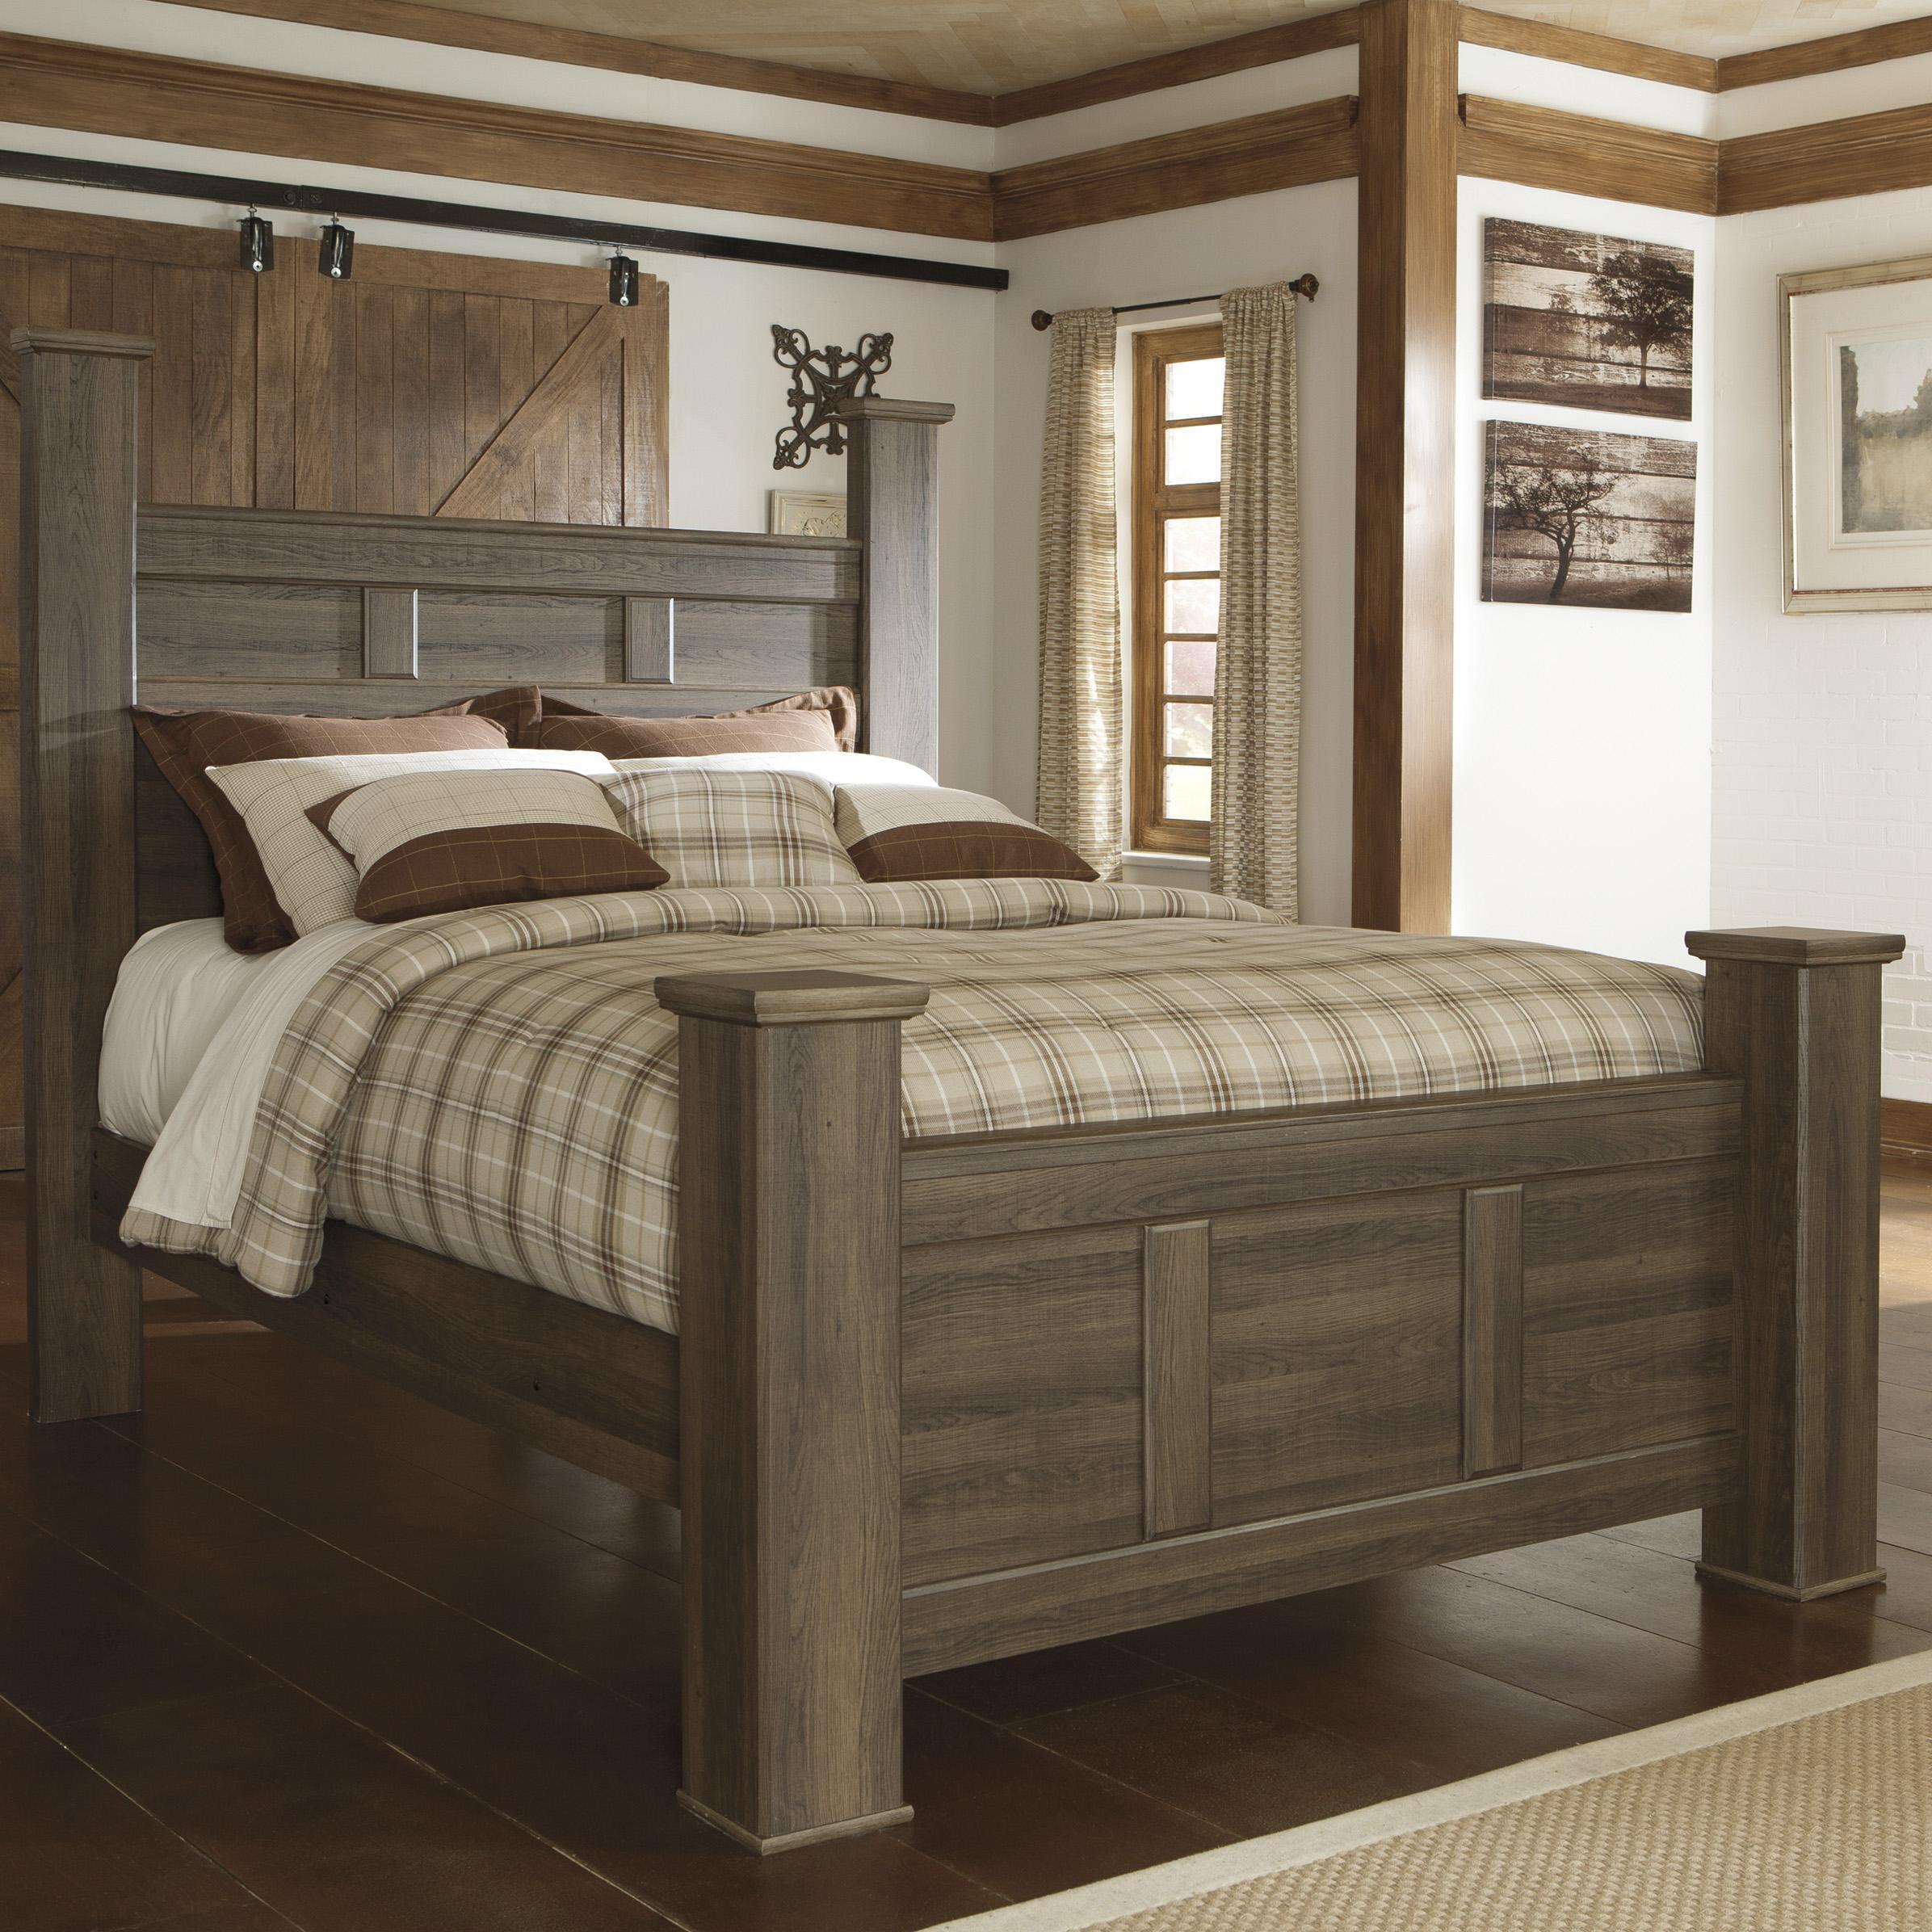 signature design by ashley juararo transitional queen poster bed del sol furniture poster beds. Black Bedroom Furniture Sets. Home Design Ideas